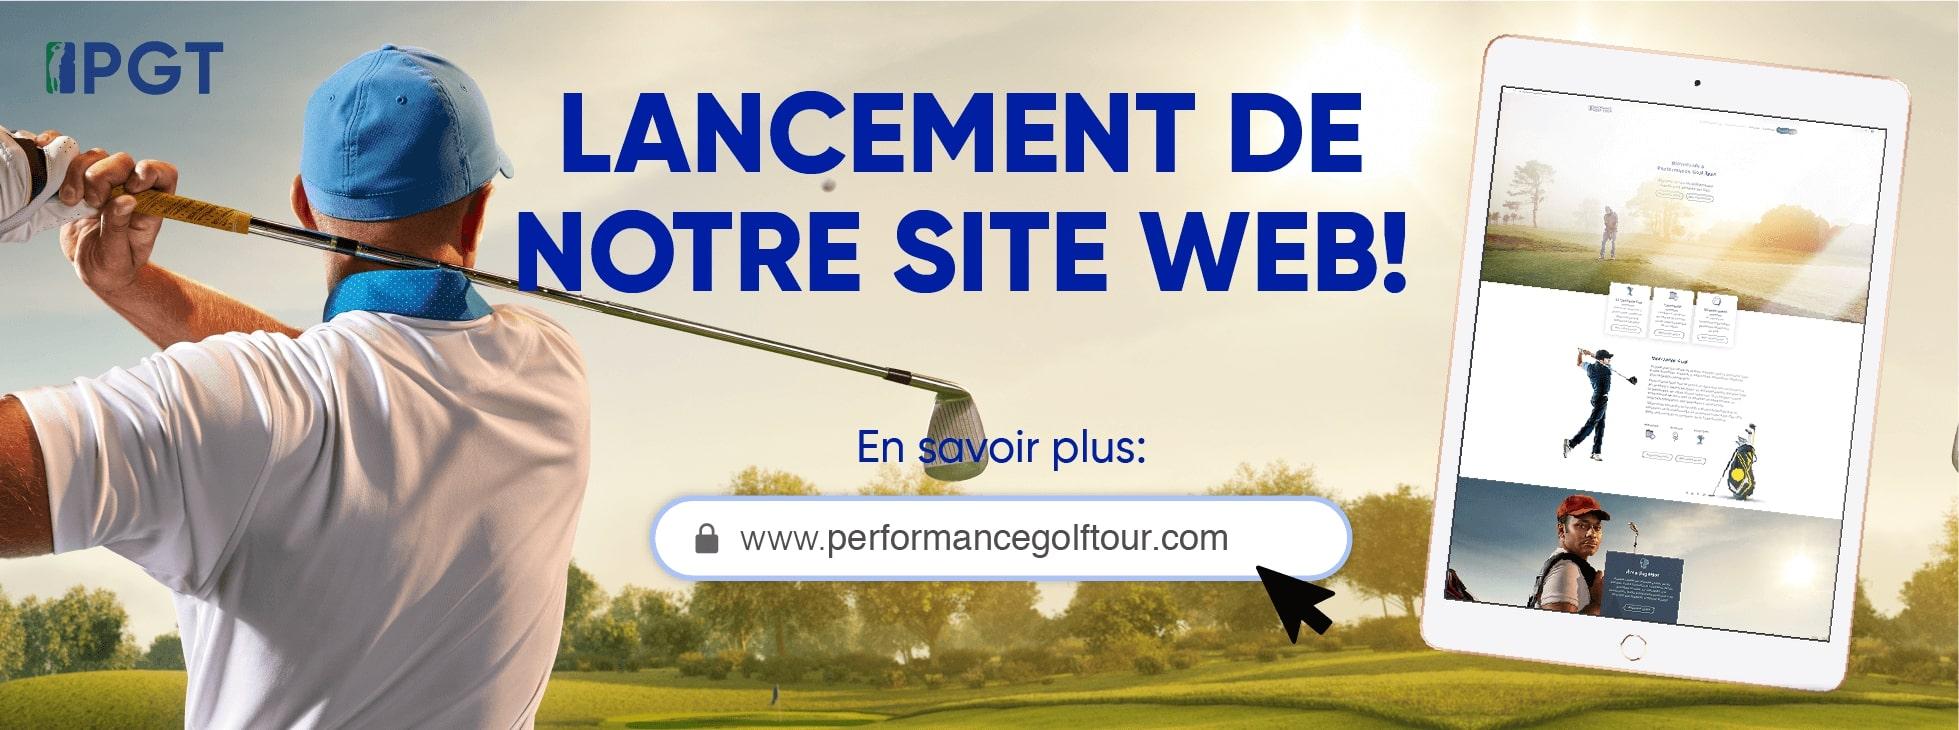 performance golf tour web